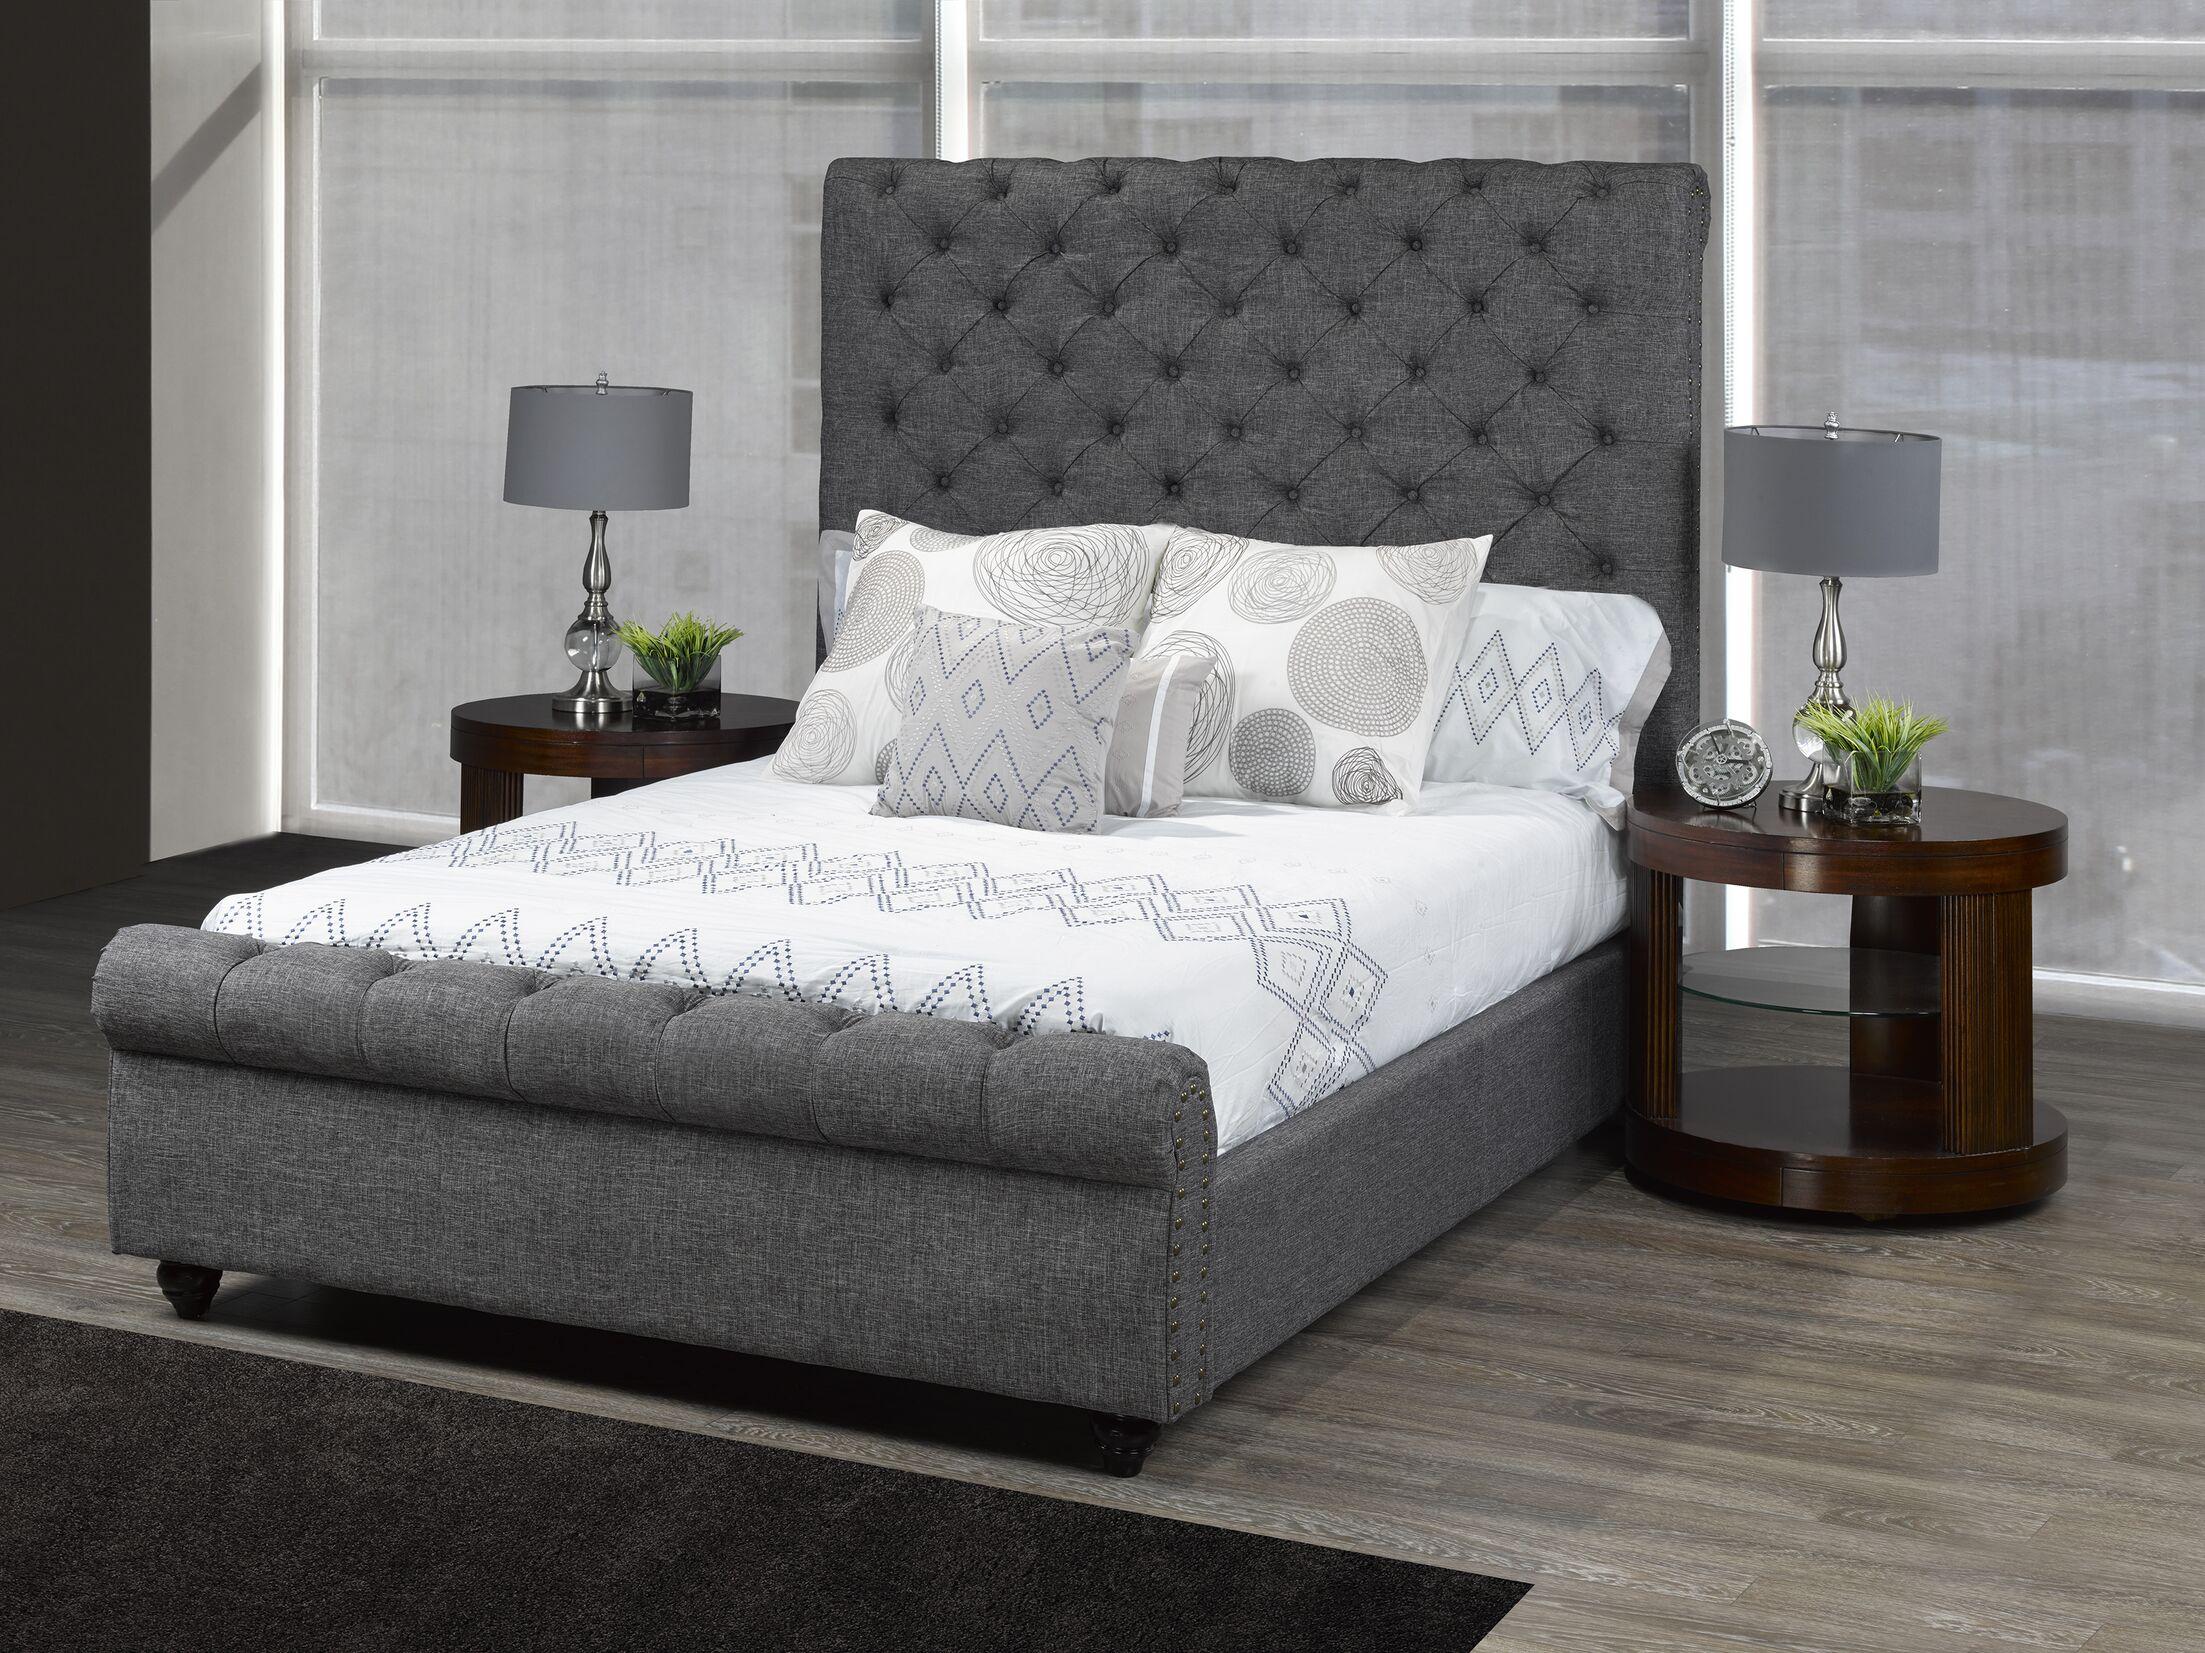 Allistair Upholstered Platform Bed Color: Gray, Size: Queen